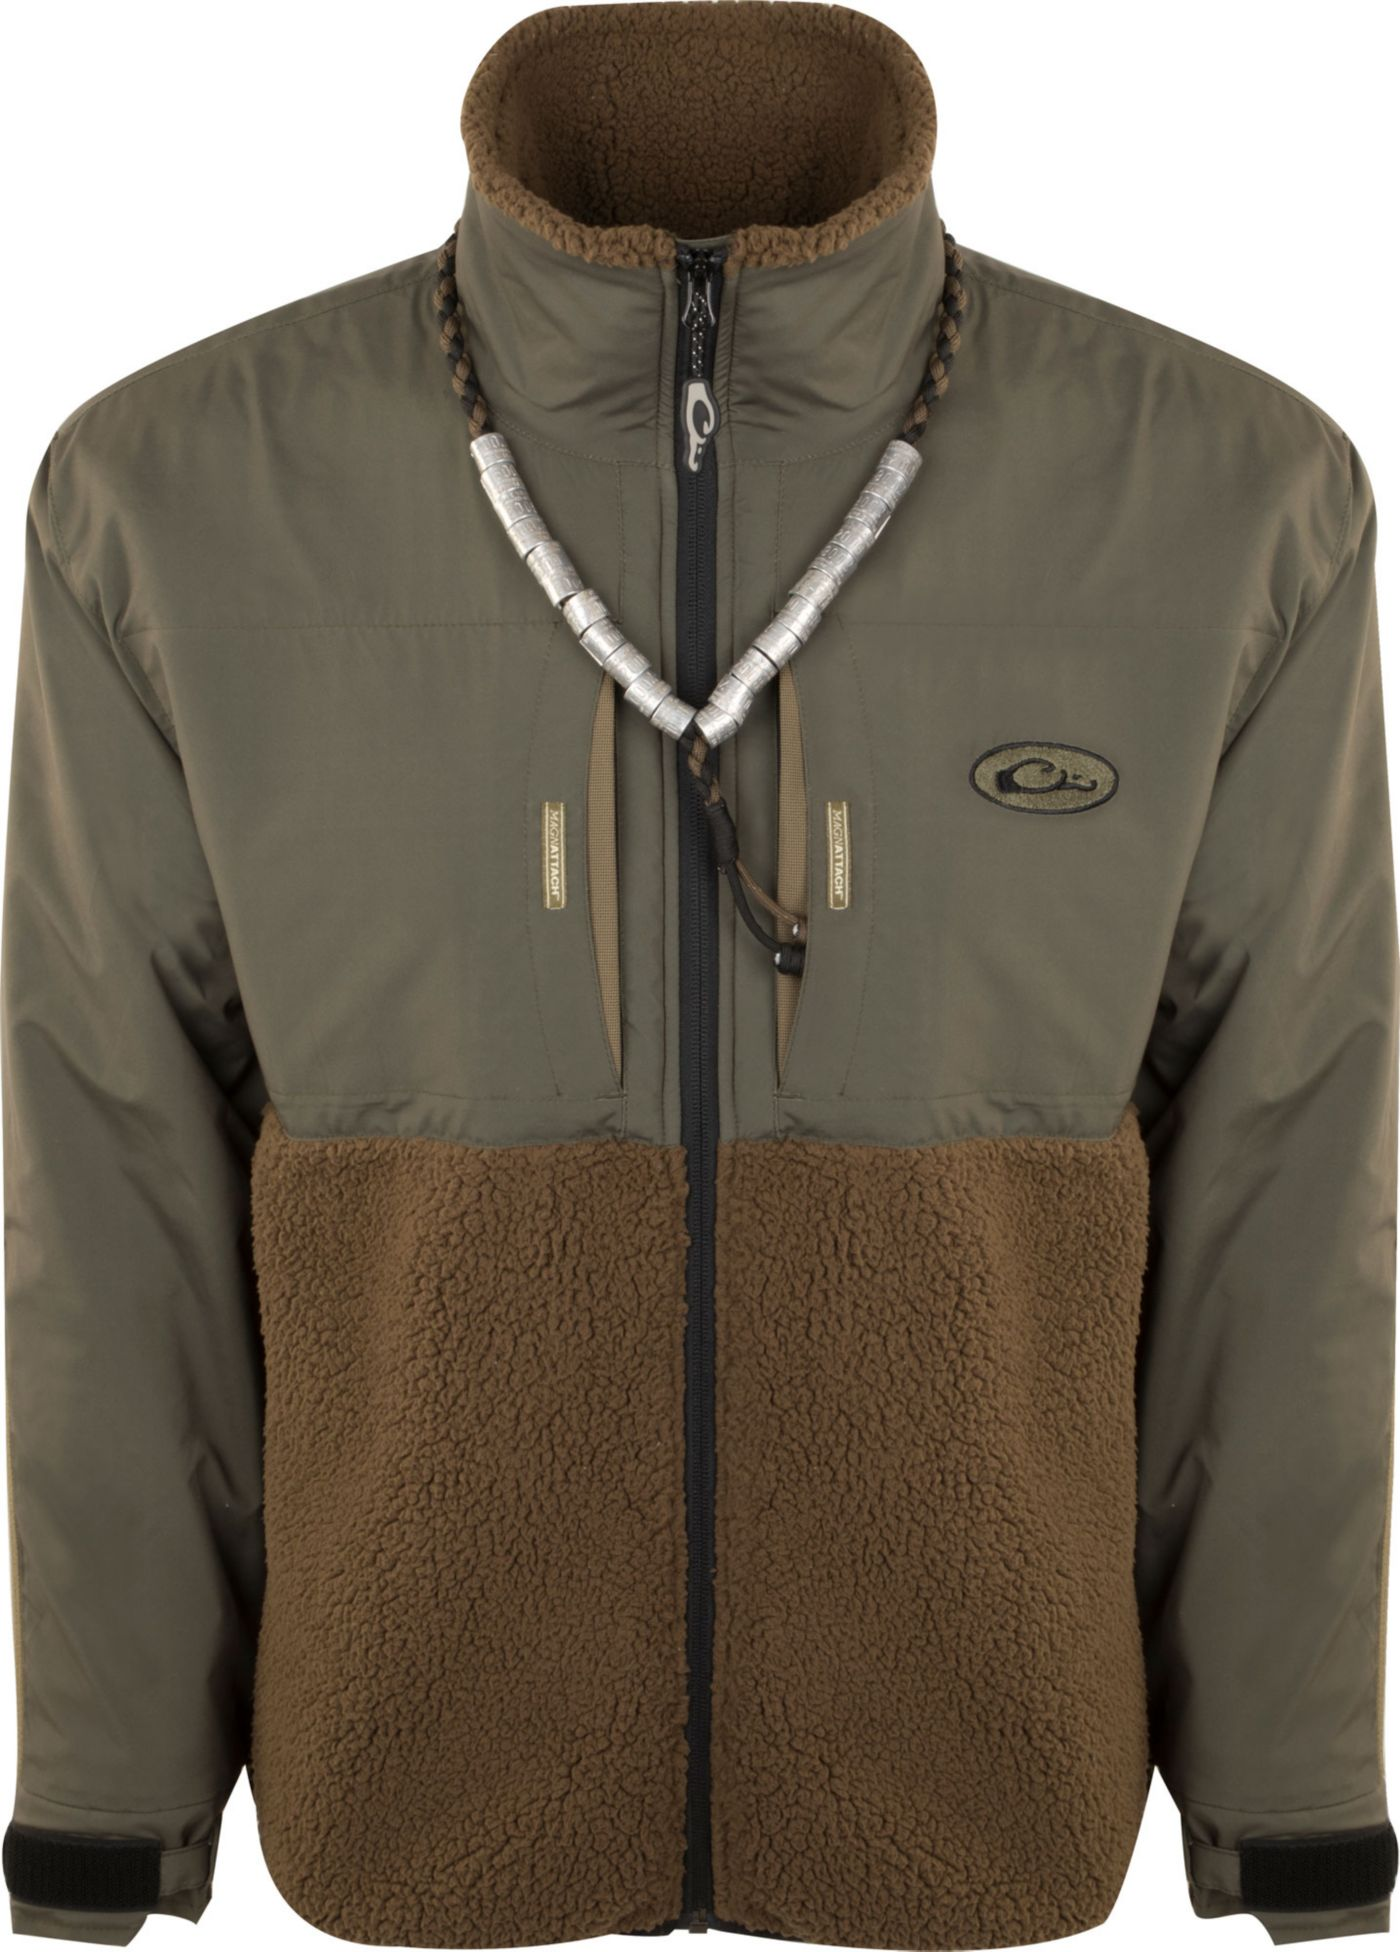 Drake Waterfowl Men's Guardian Flex Sherpa Fleece Eqwader Full Zip Hunting Jacket